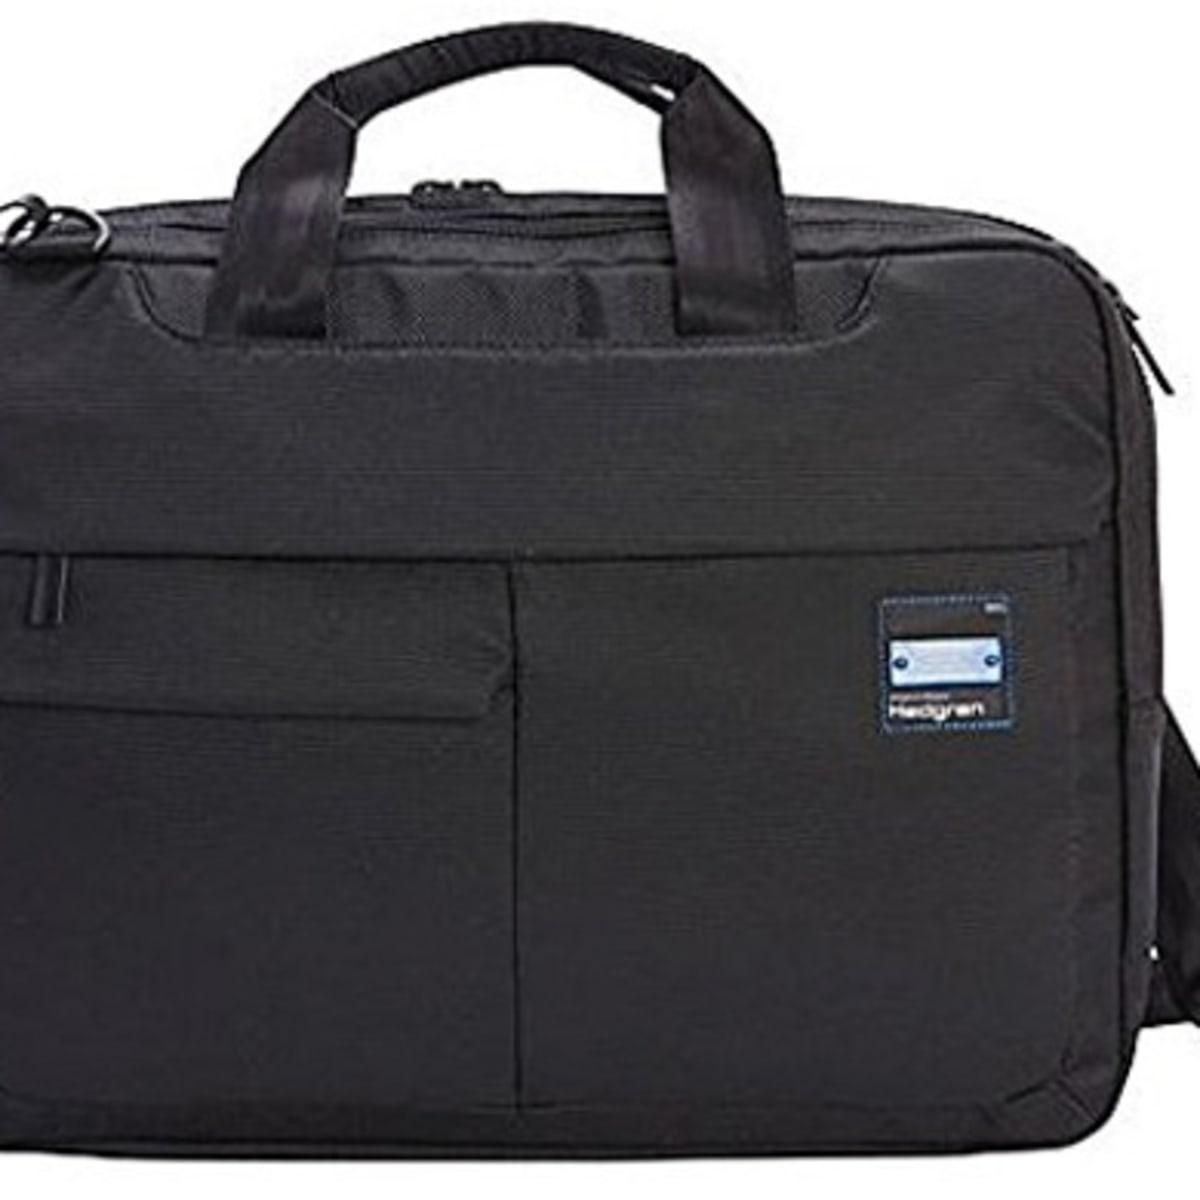 DOCUMENT BAG ZIPPED LAPTOP MESSENGER BAG STORAGE SHOULDER STRAP 3 COLOURS